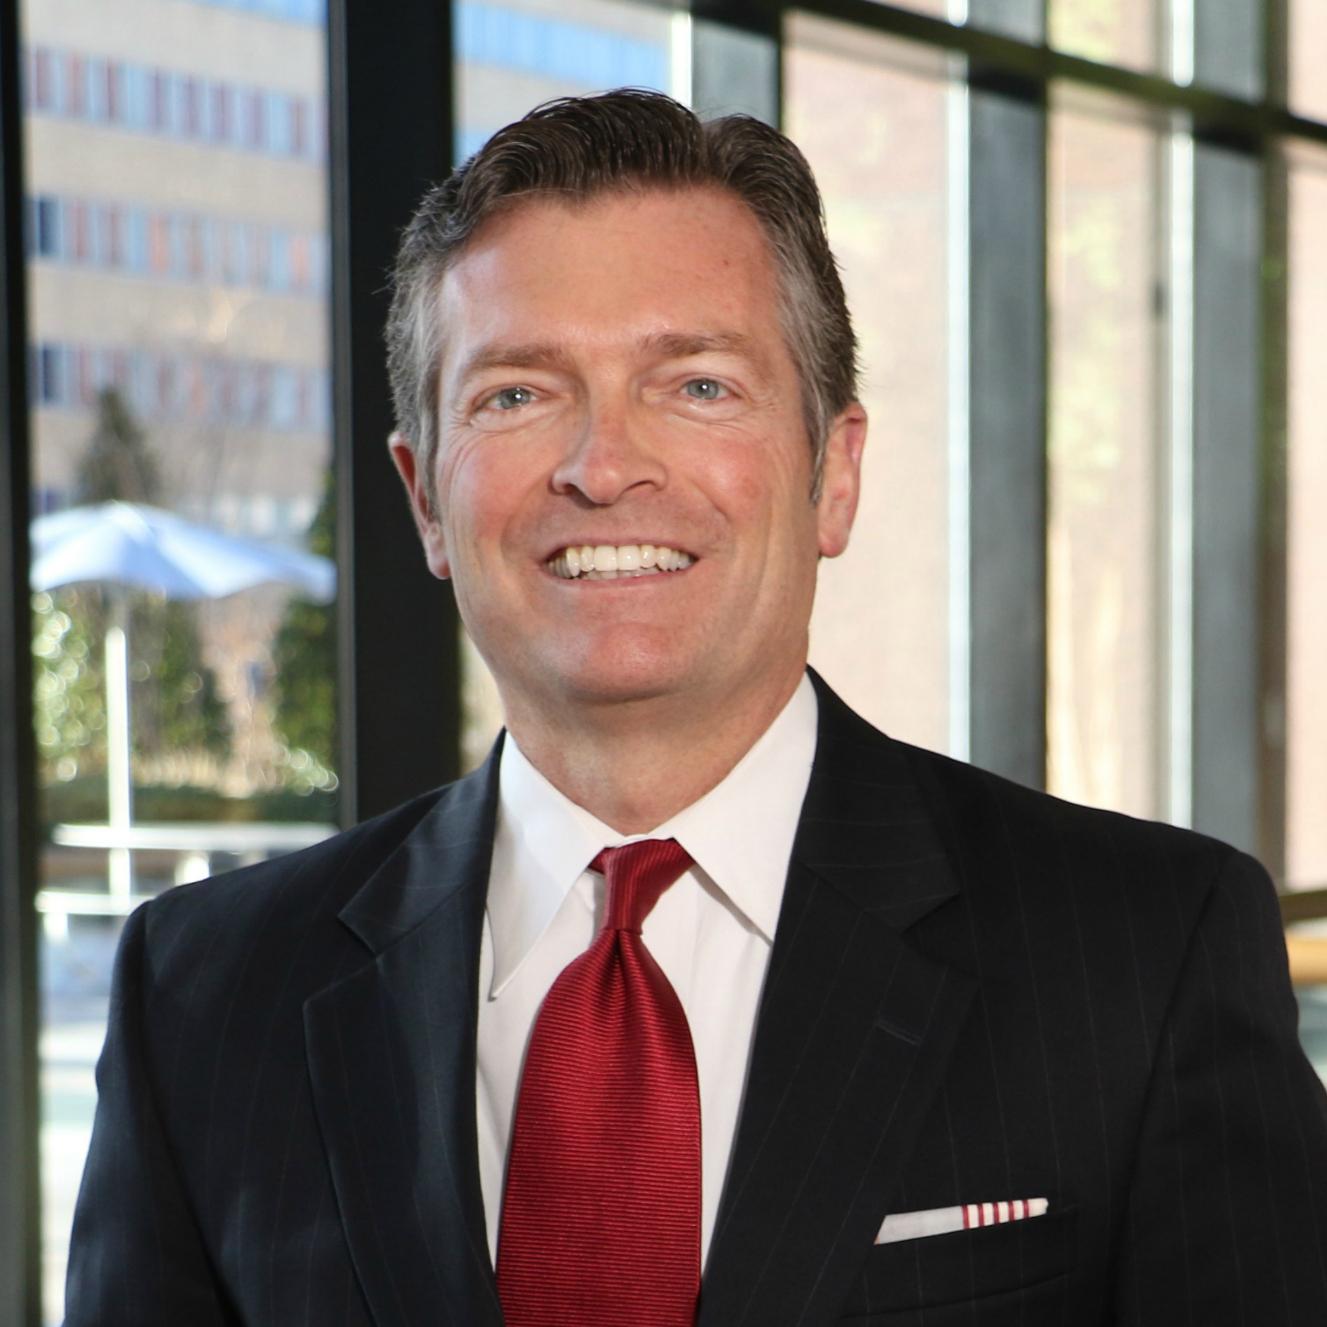 Chris S. Thrutchley